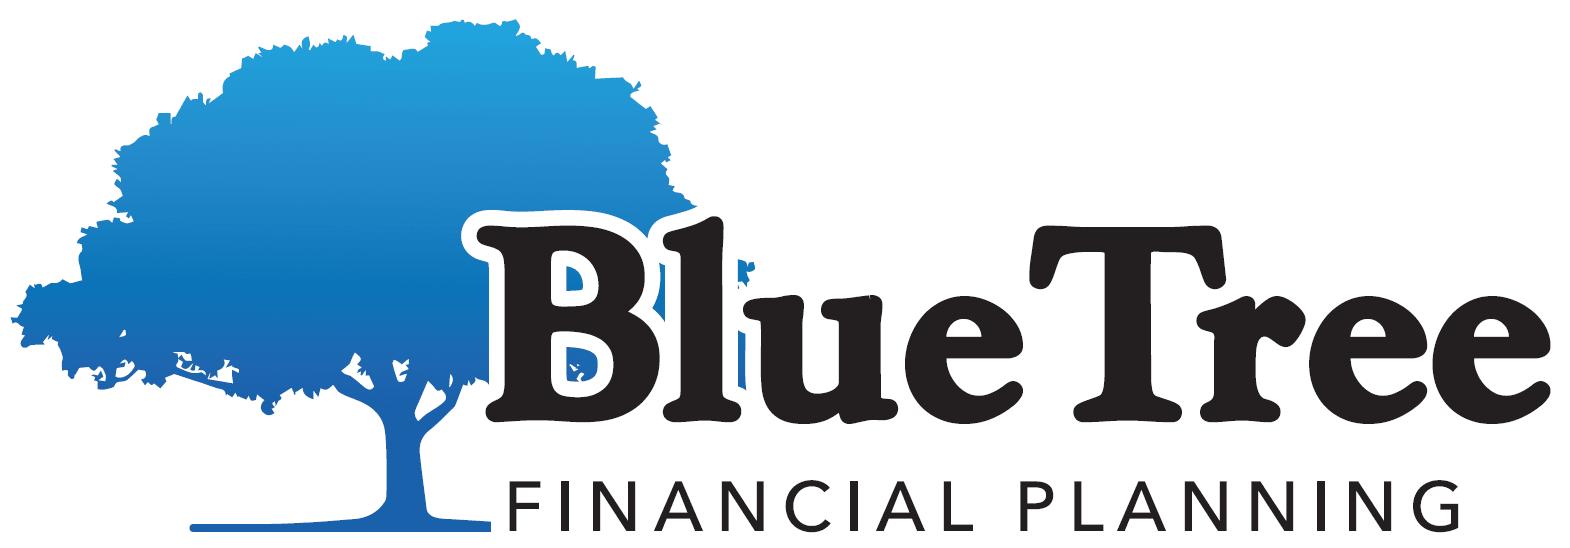 Blue Tree Financial Planning Brisbane